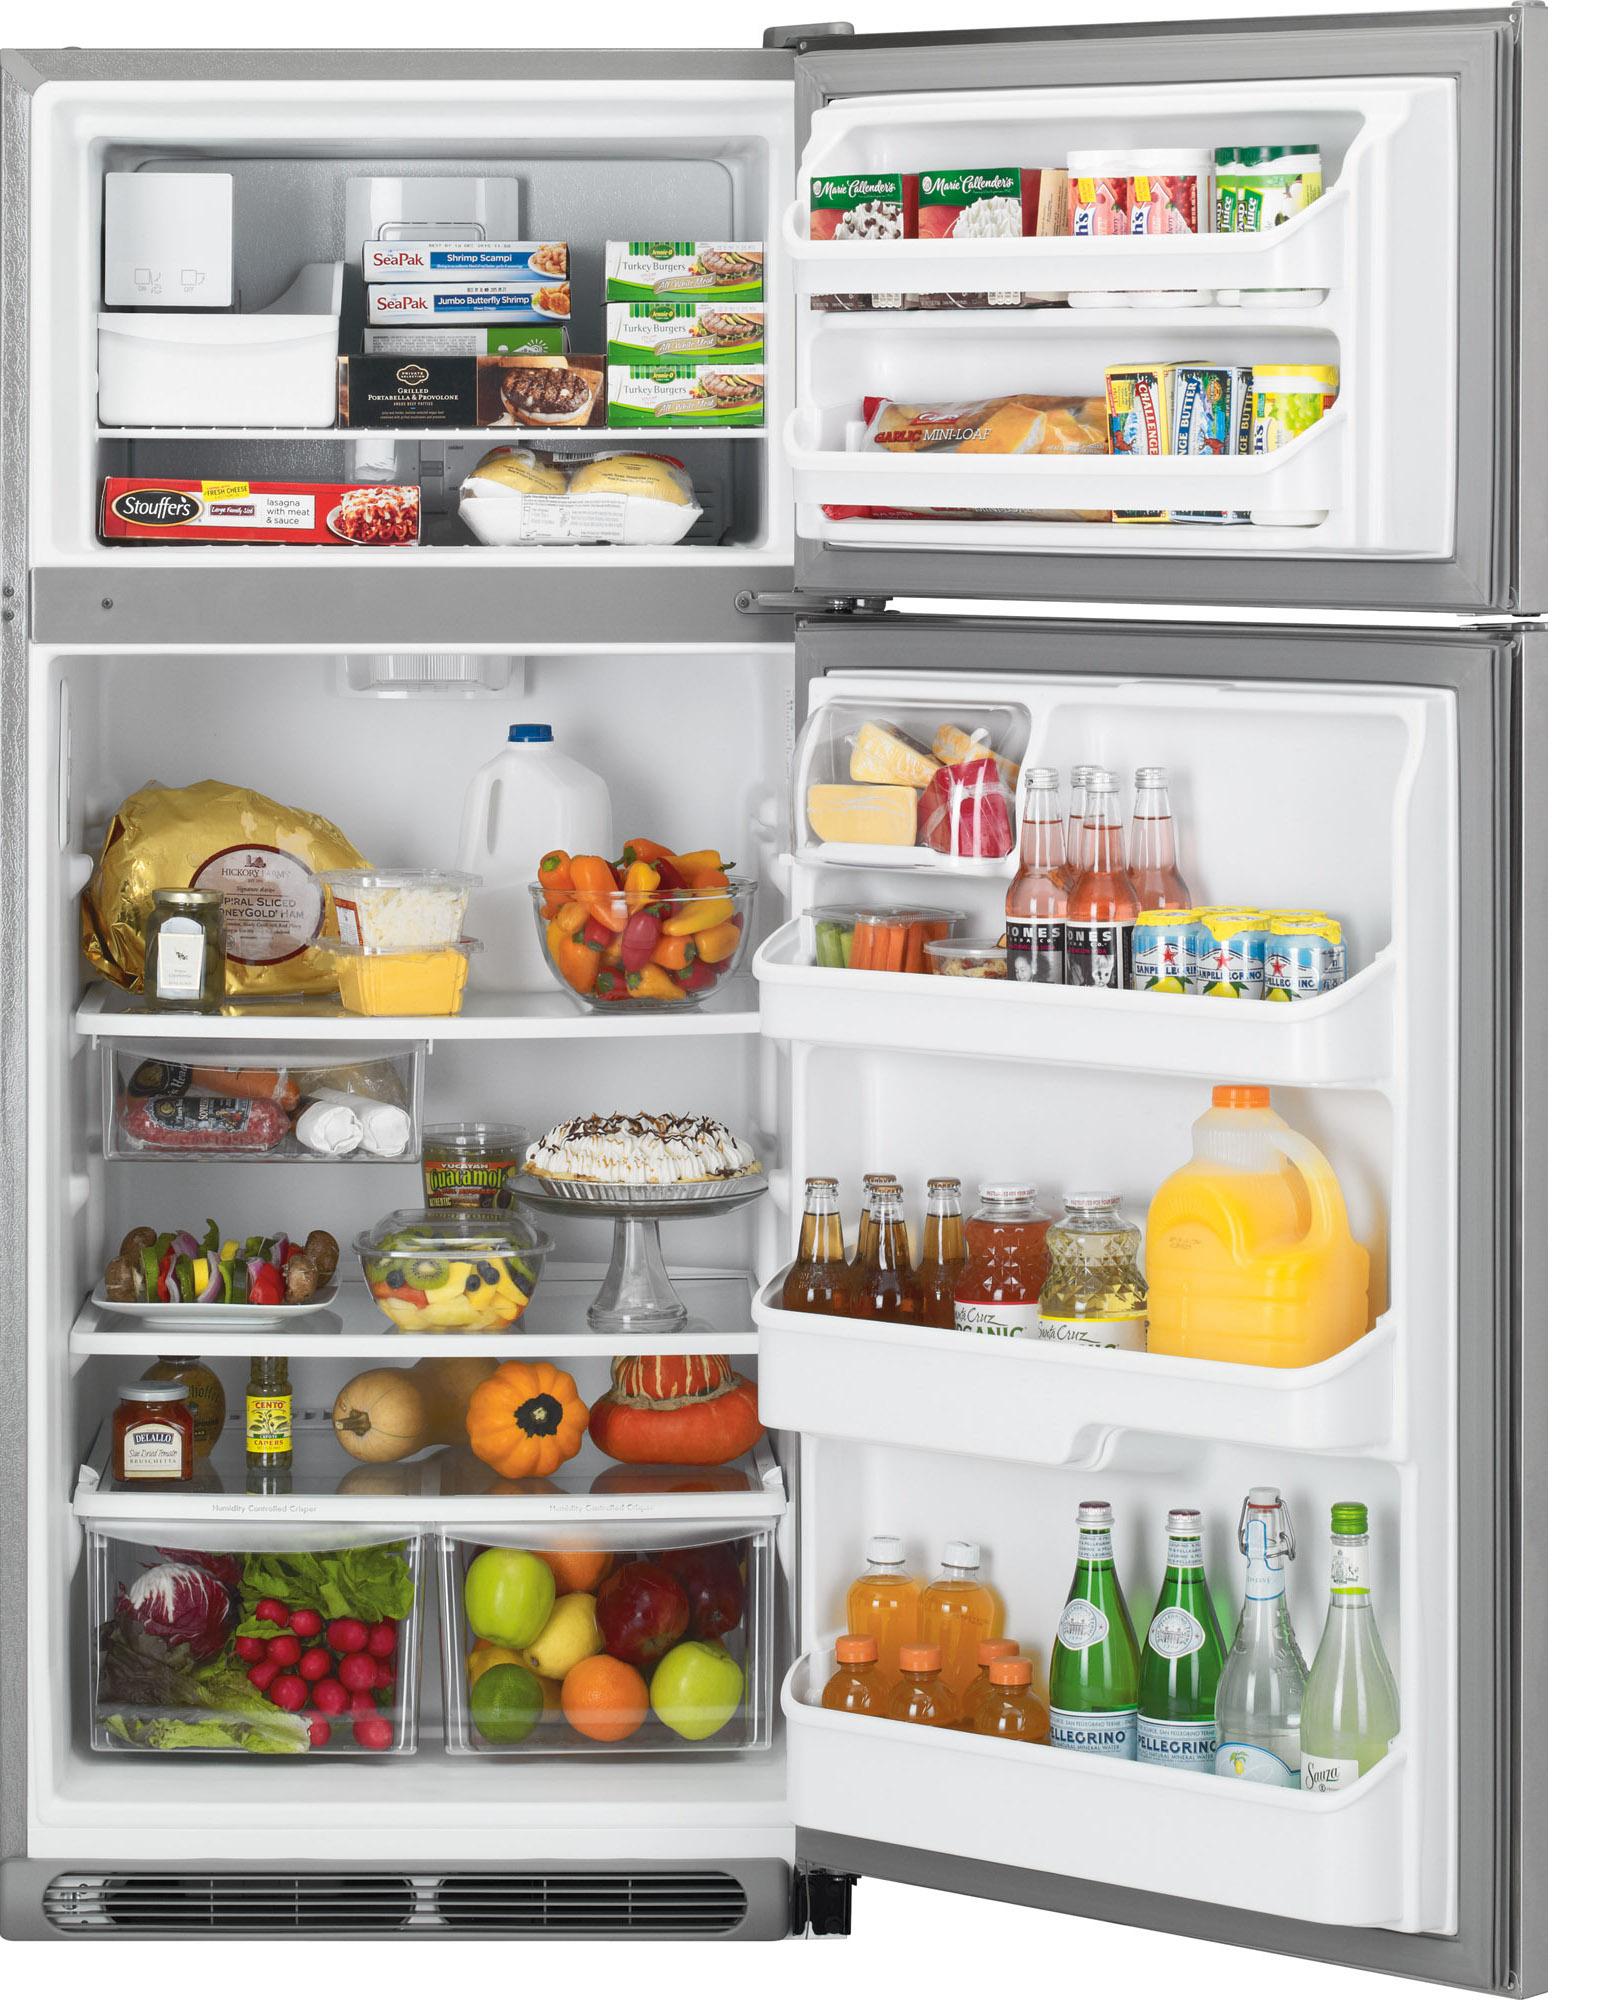 Kenmore 70603 18 cu. ft. Top Freezer Refrigerator - Stainless Steel